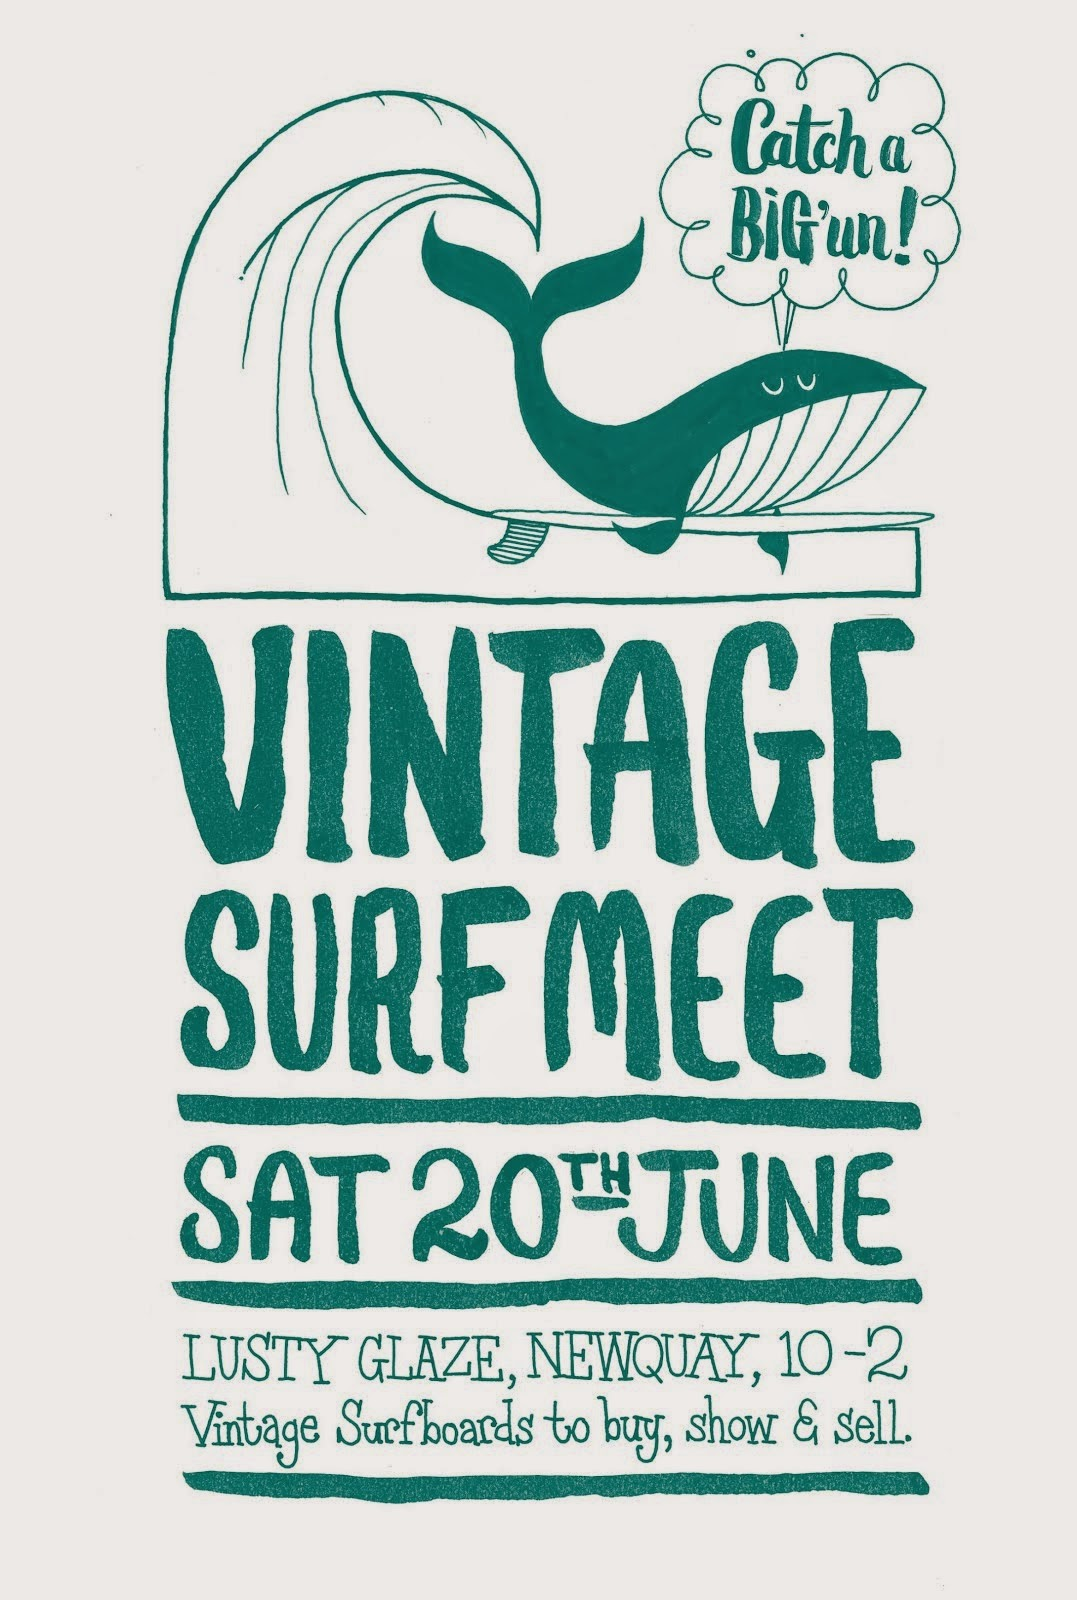 Vintage Surfboard Collection France